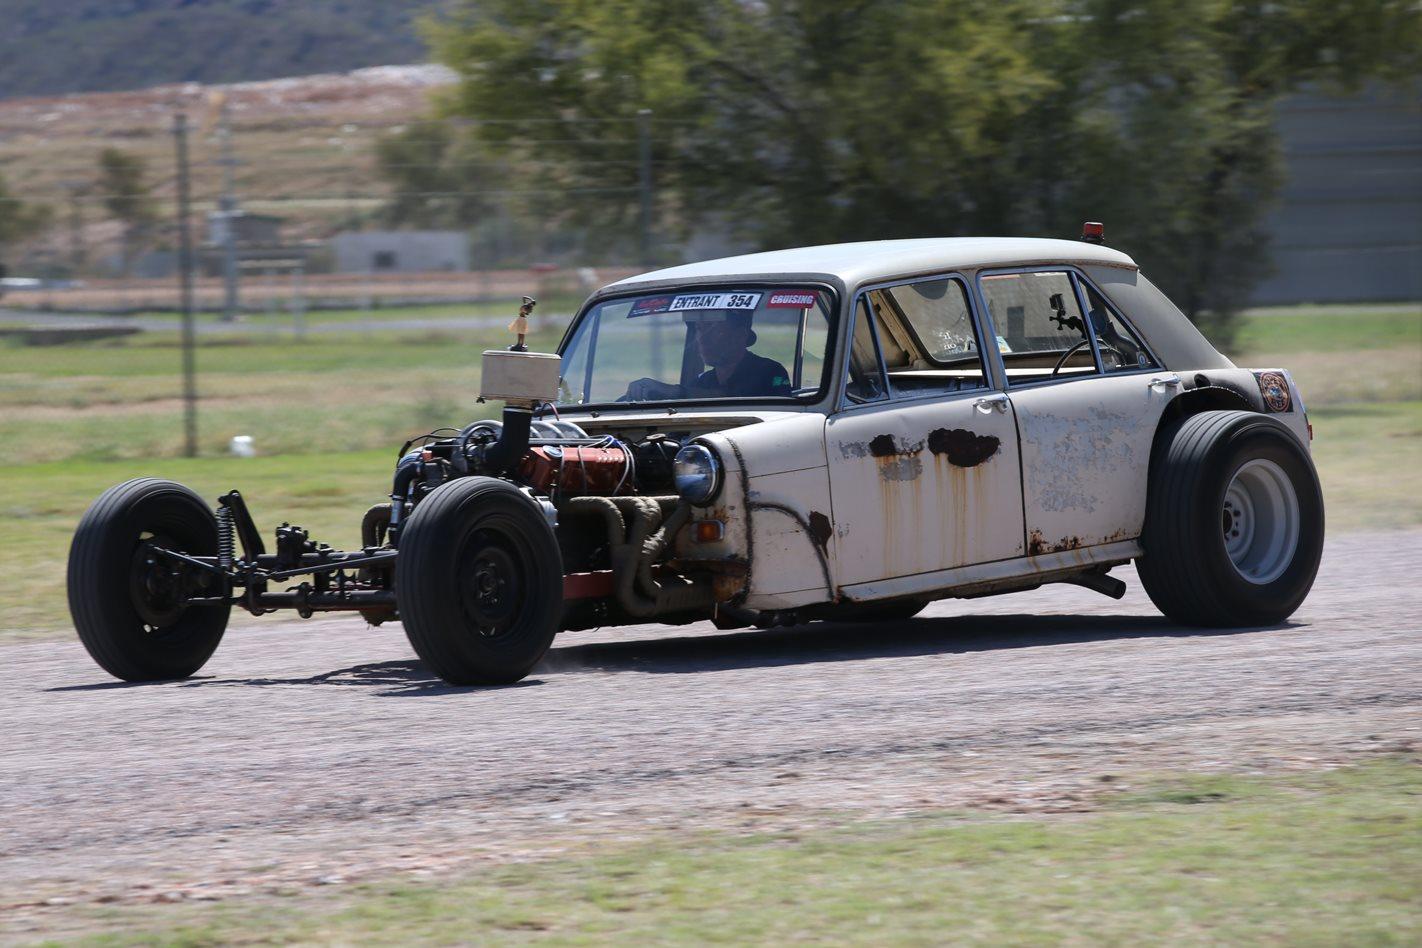 The Crazy Test Race Car